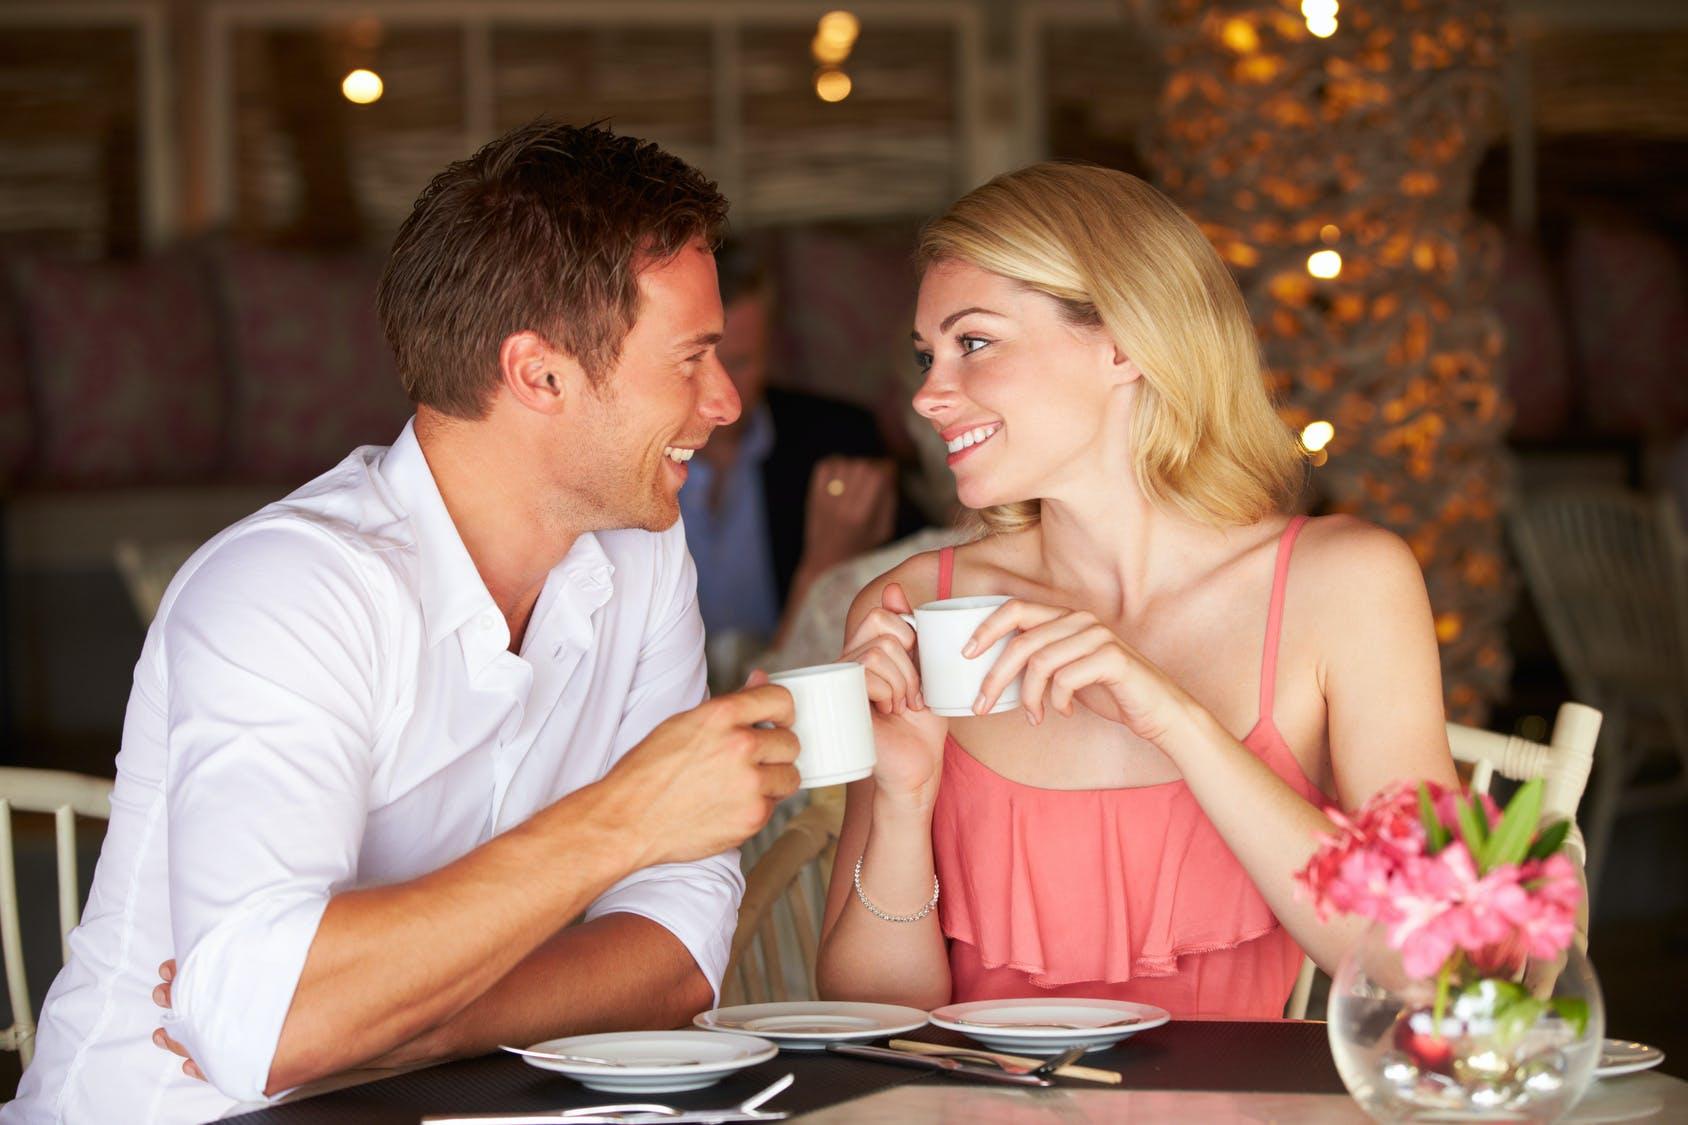 Suosituimmat online dating sites 2014mitä teet, kun olet dating joku